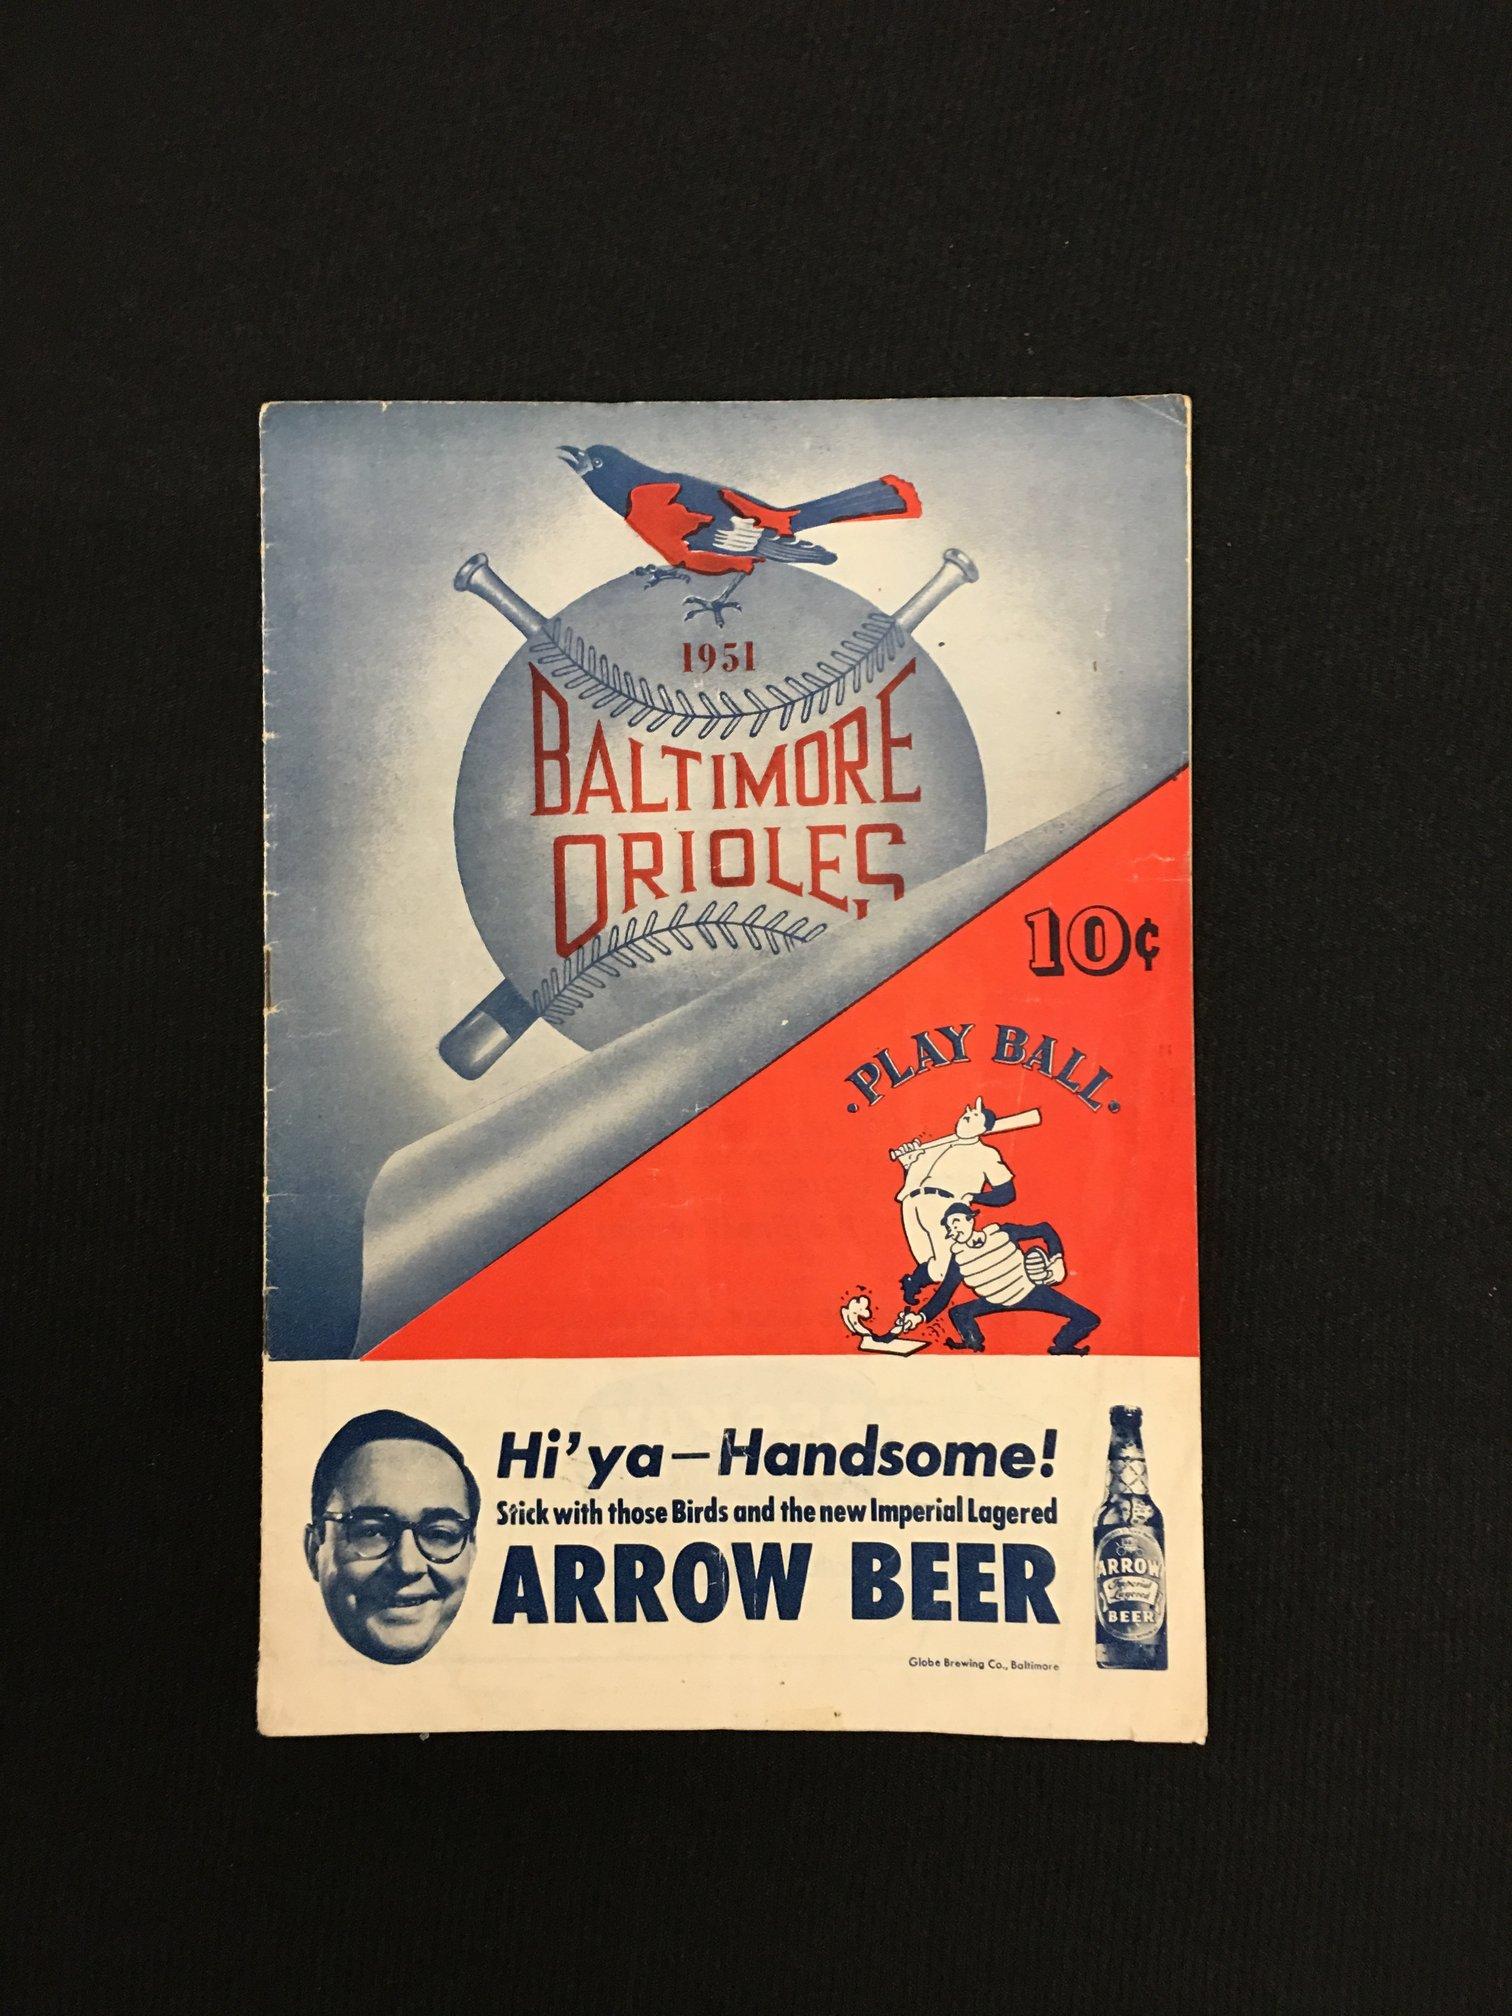 1951 Baltimore Orioles Program (International League)